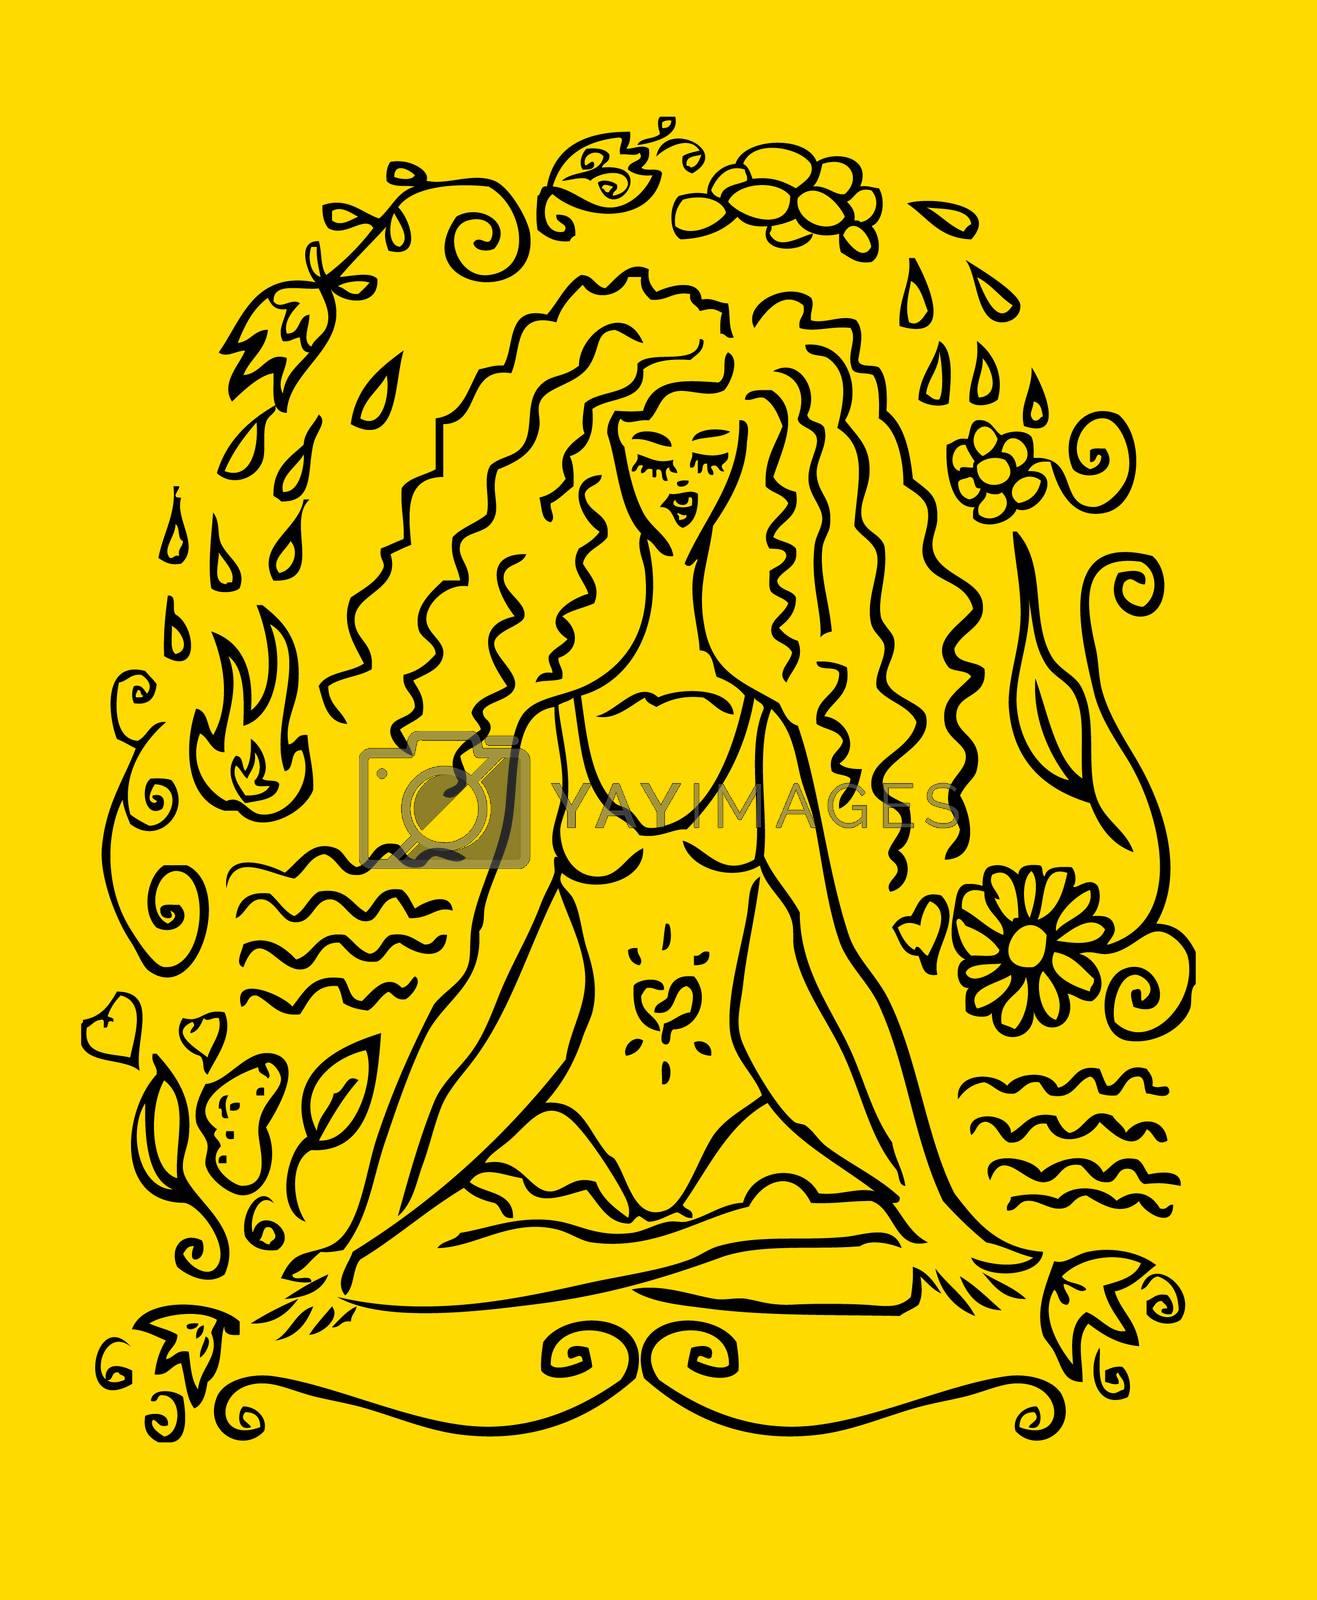 Yoga woman tattoo fake card, emblem, icon. Yellow background